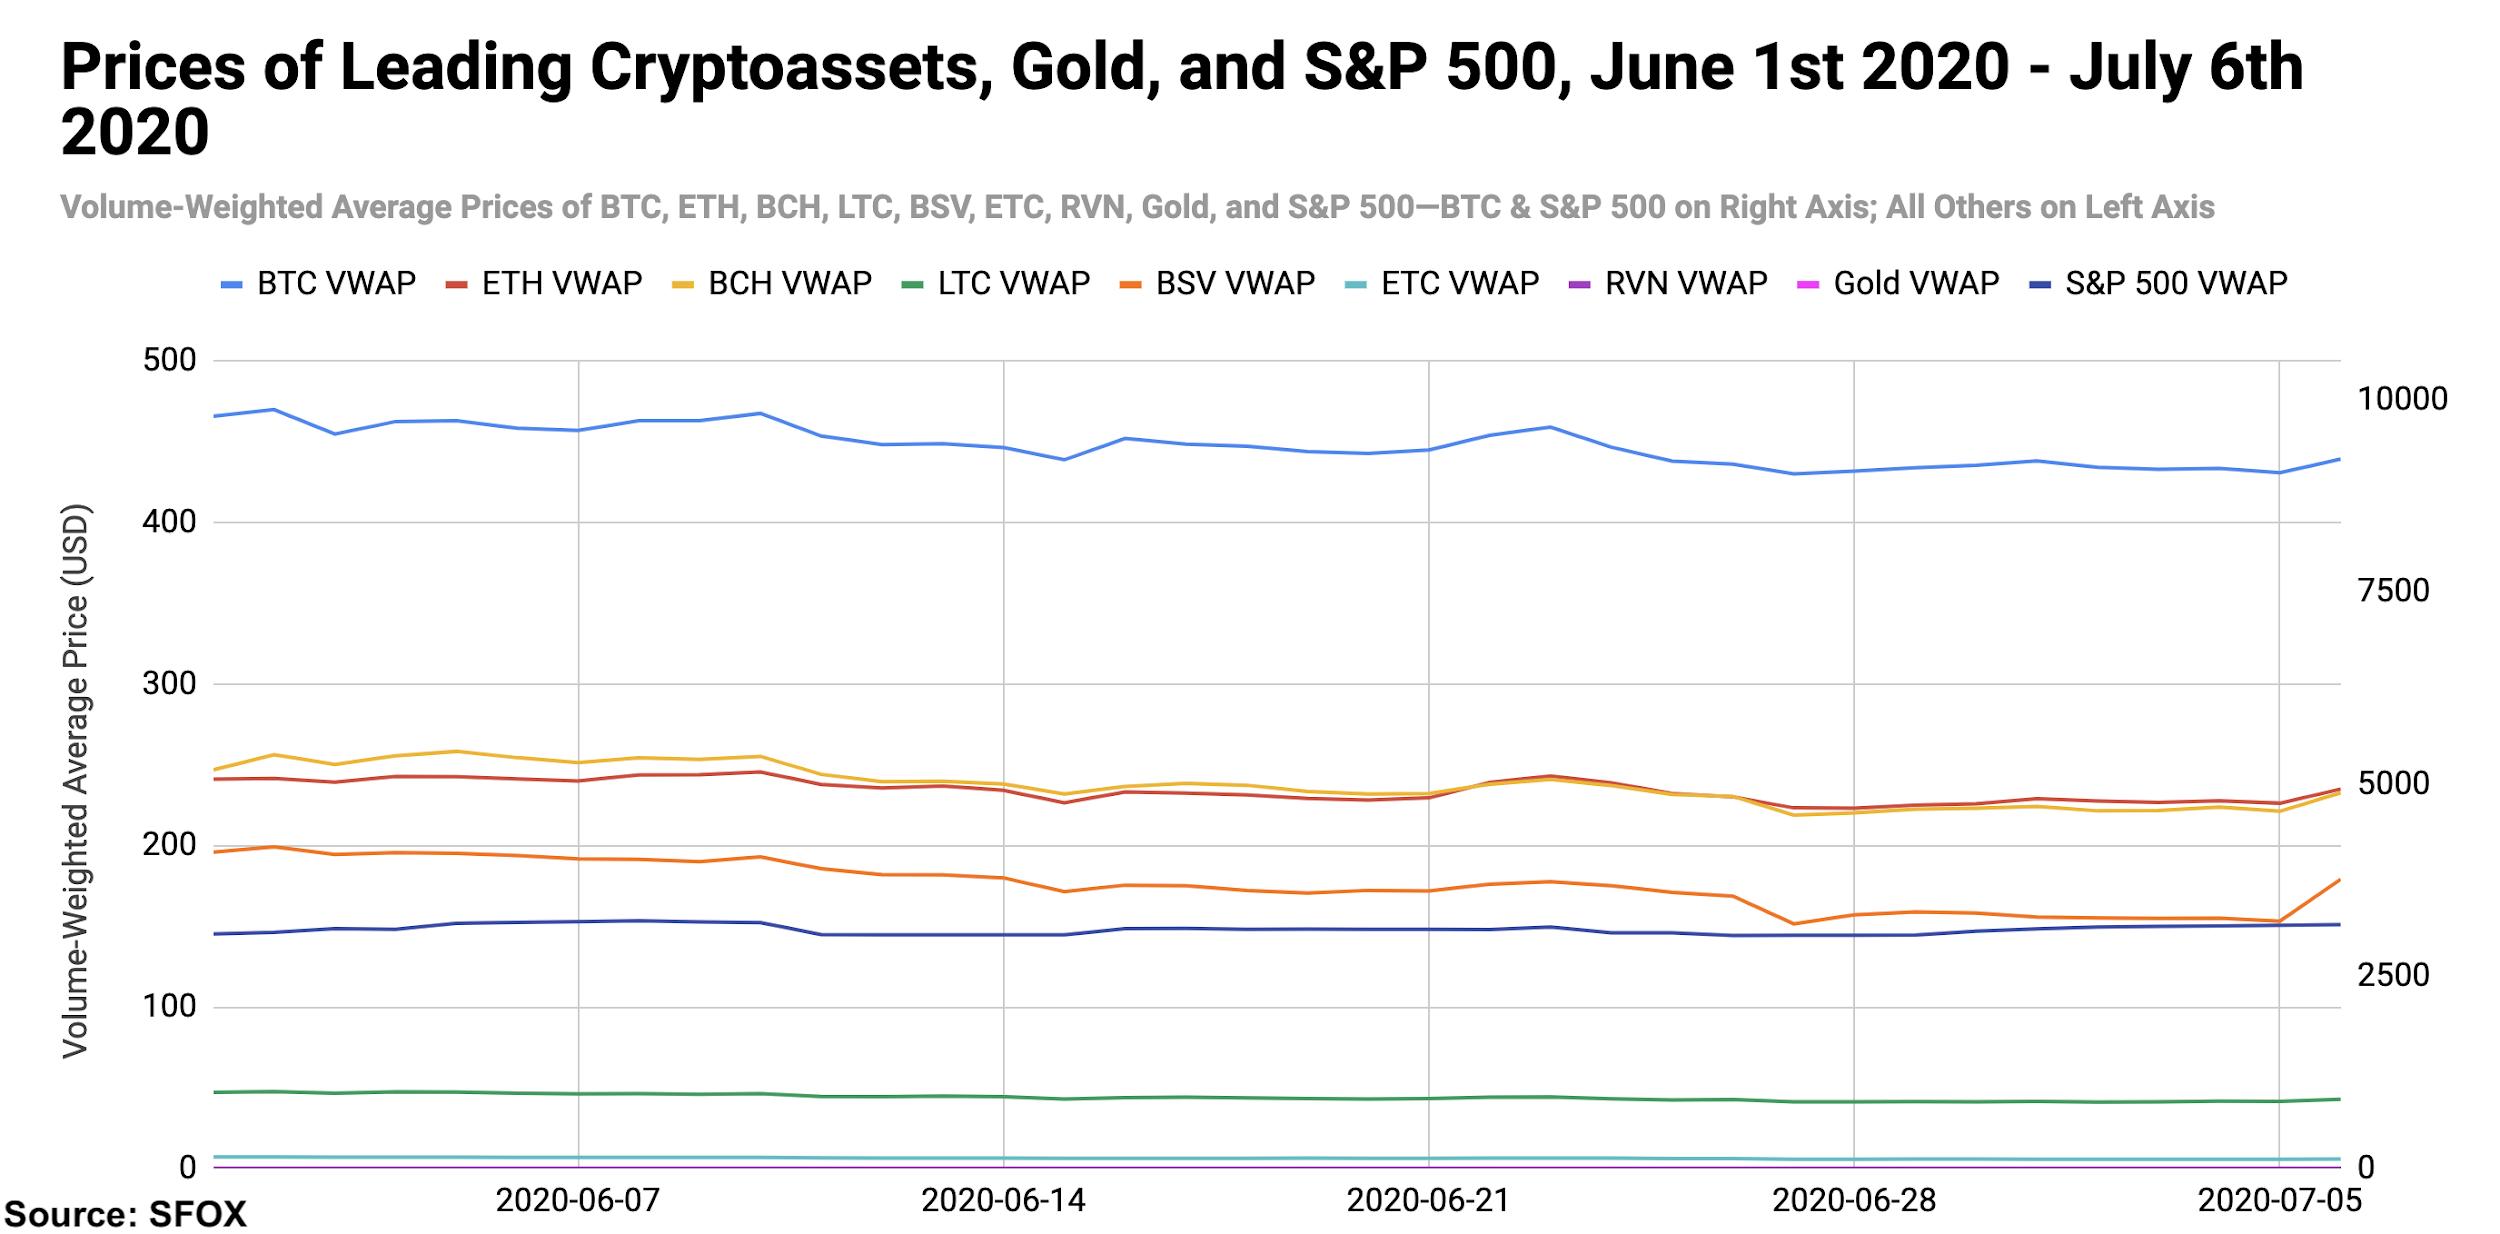 Bitcoin crypto S&P 500 gold price chart July 2020.